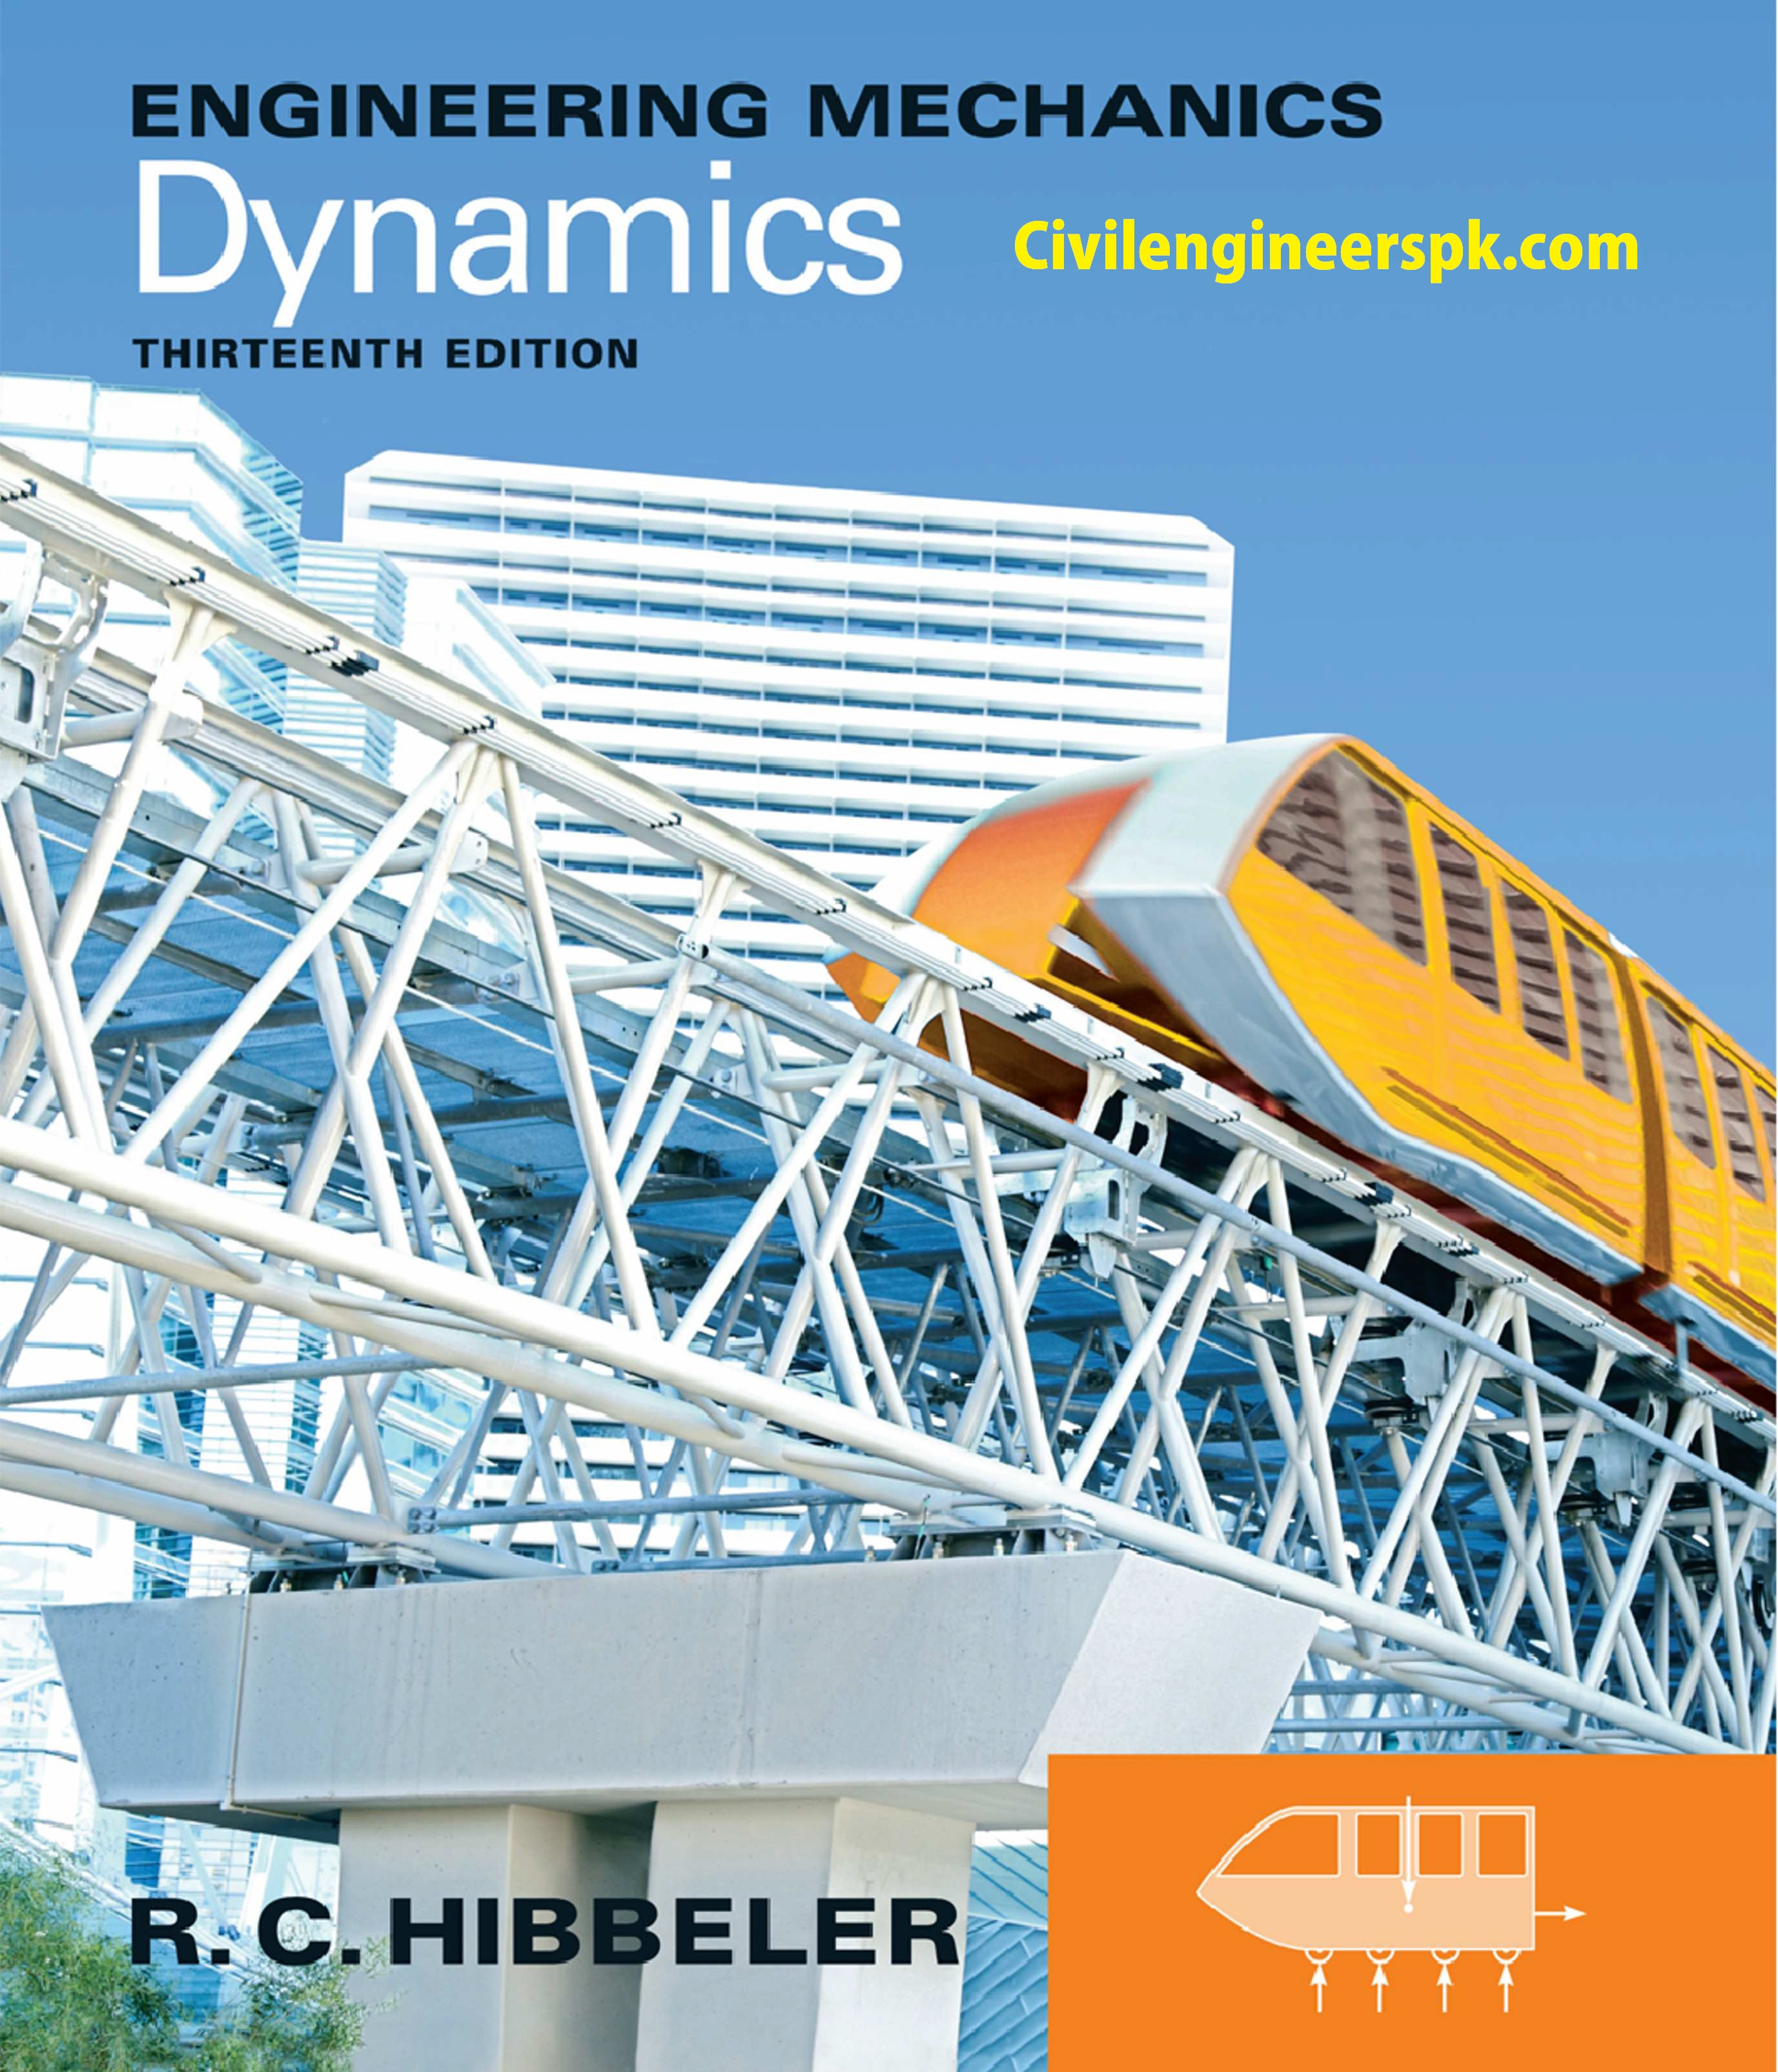 Engineering Mechanics Dynamics 13th edition By R. C. Hibbeler. Engineering  Mechanics Dynamics